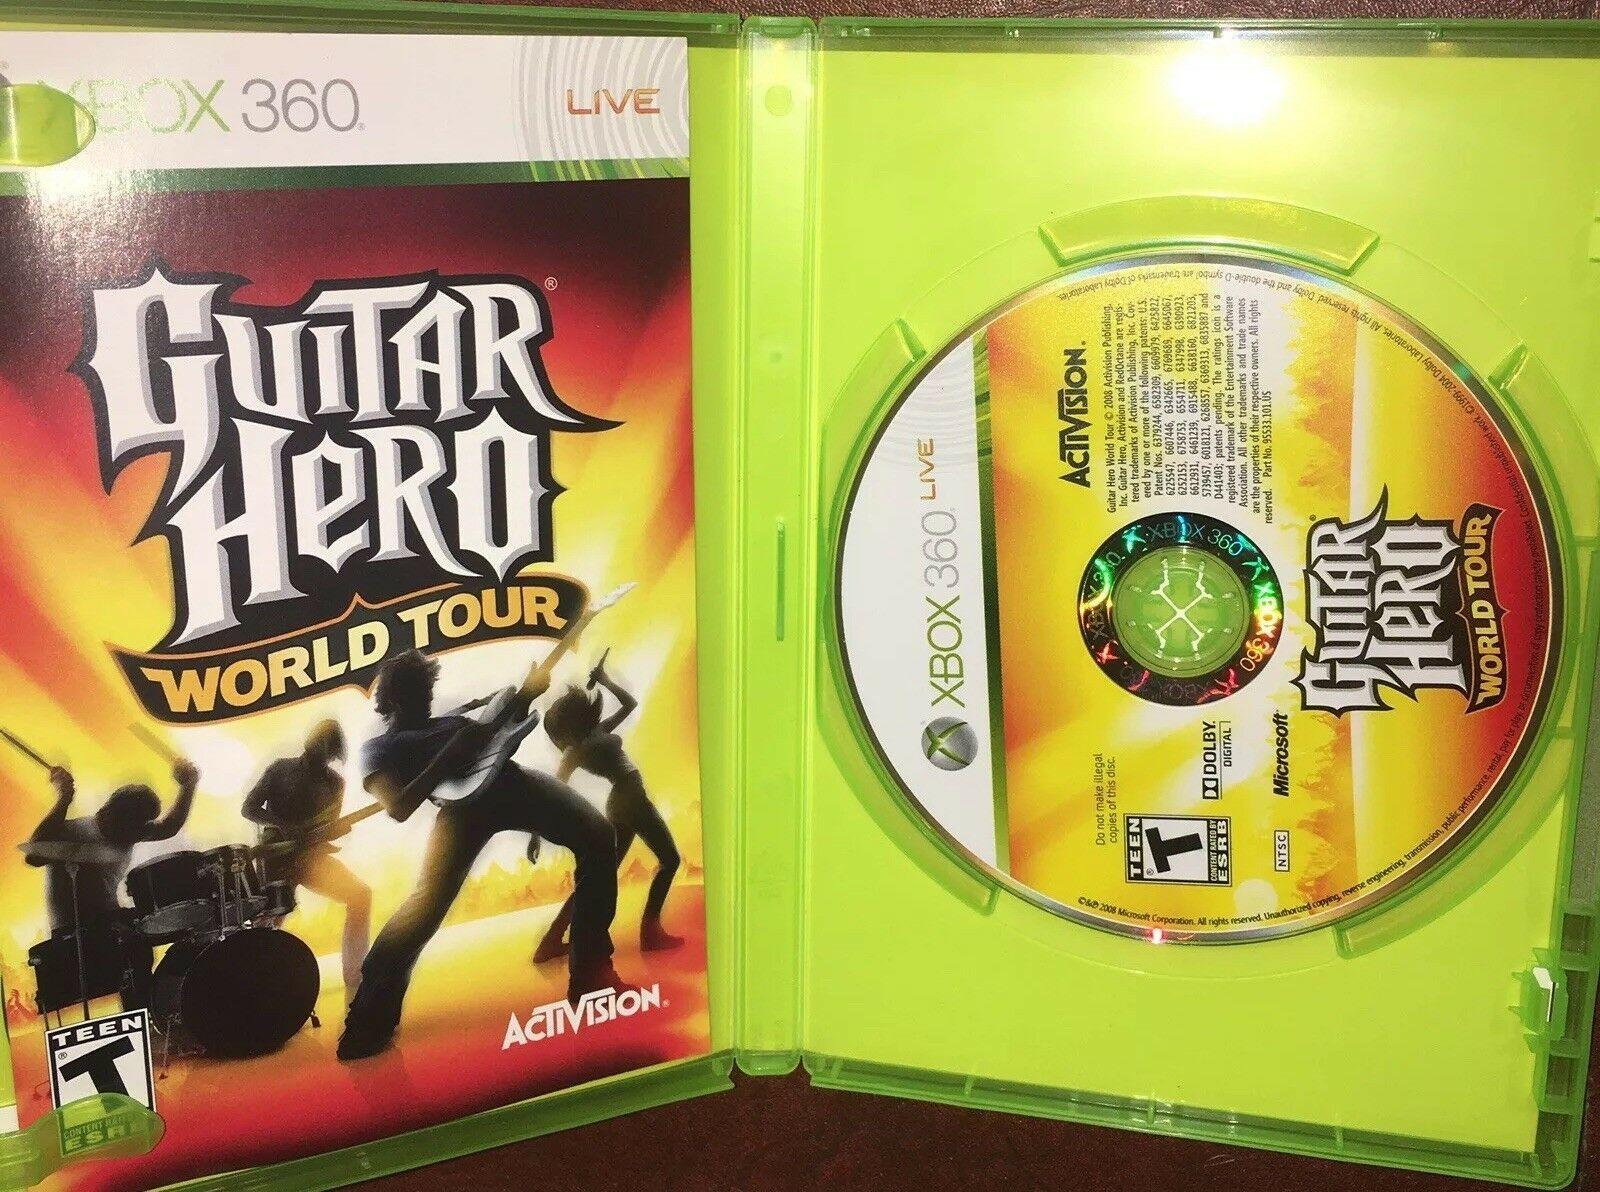 Guitar Hero: World Tour (Microsoft Xbox 360, 2008) Ships Free